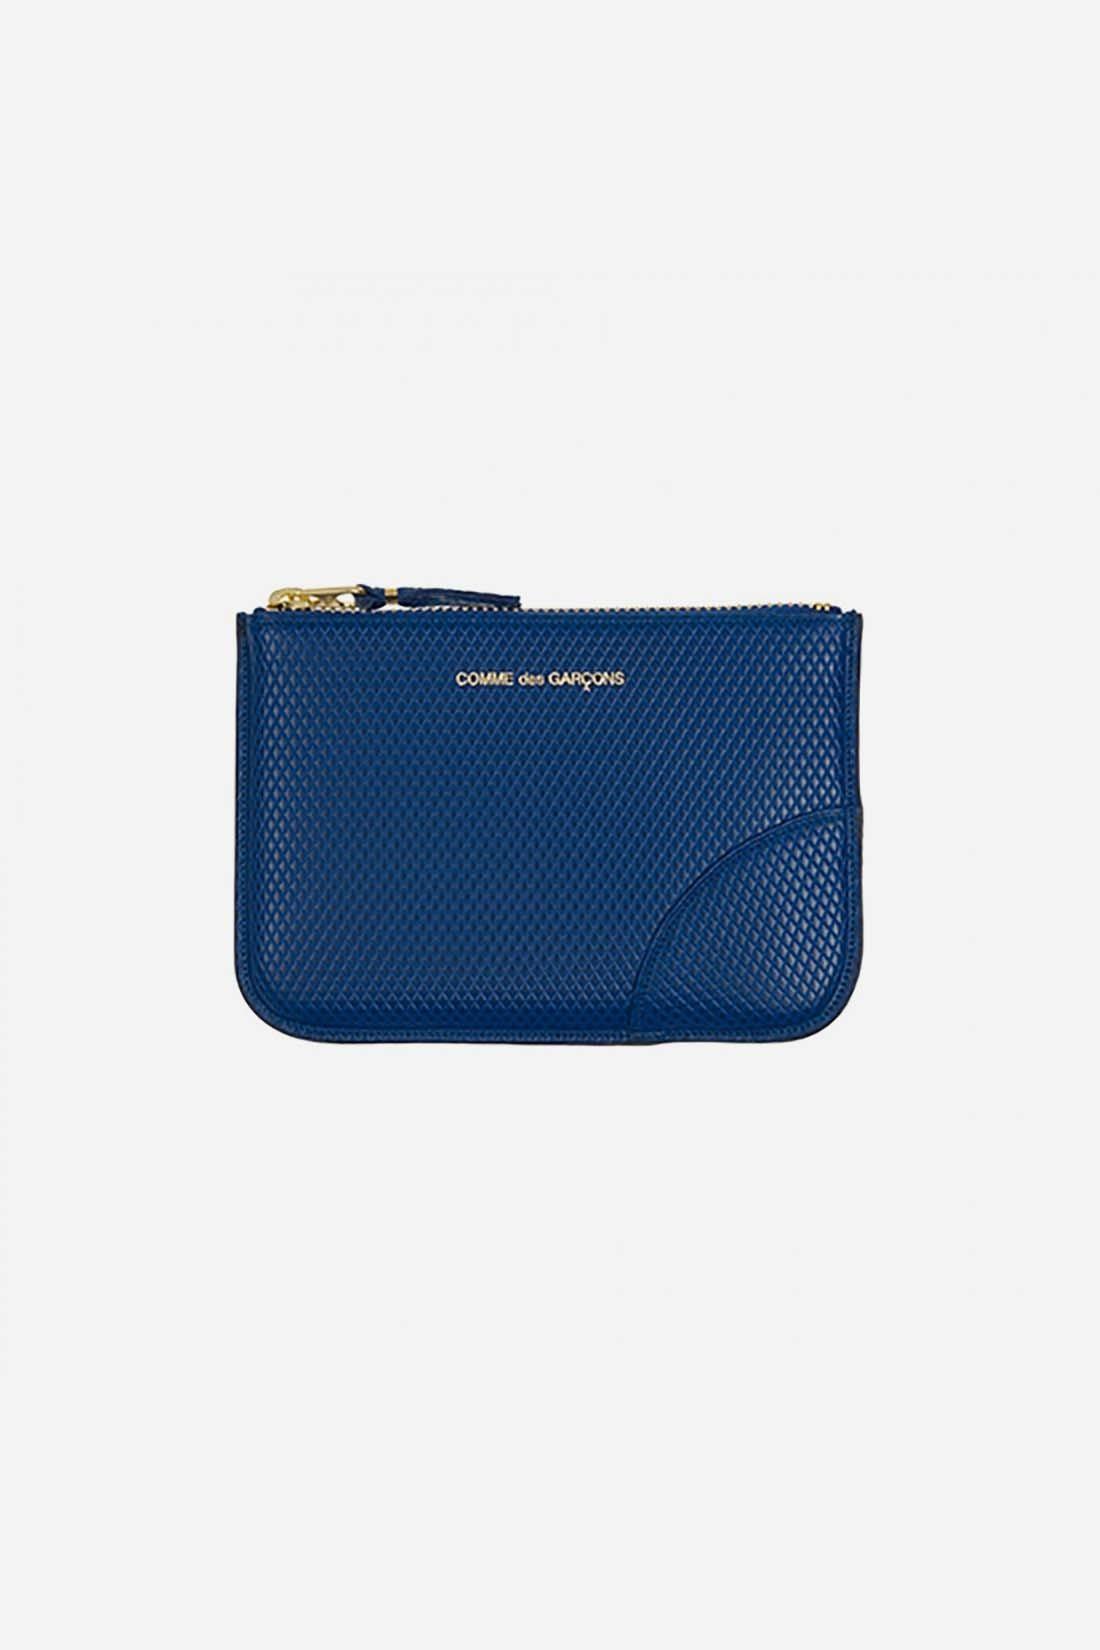 COMME DES GARÇONS WALLETS / Cdg luxury group sa8100g Blue